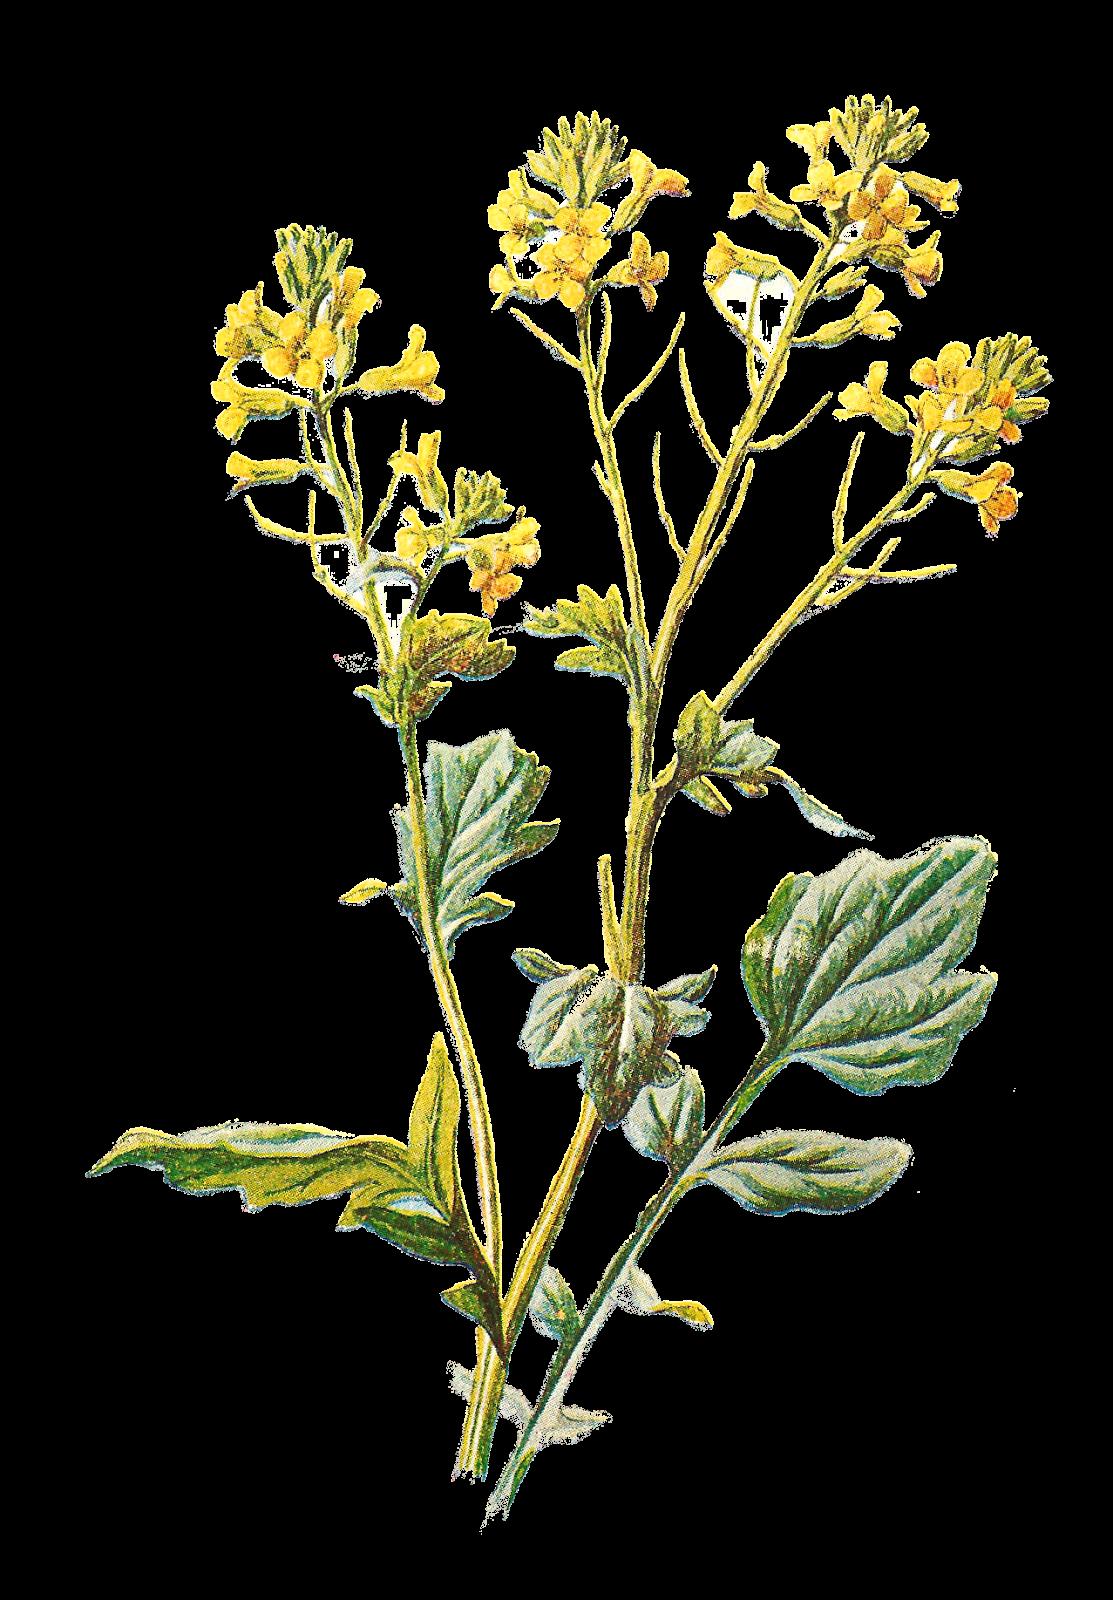 Antique Images: Wildflower Artwork Free Illustrations ...